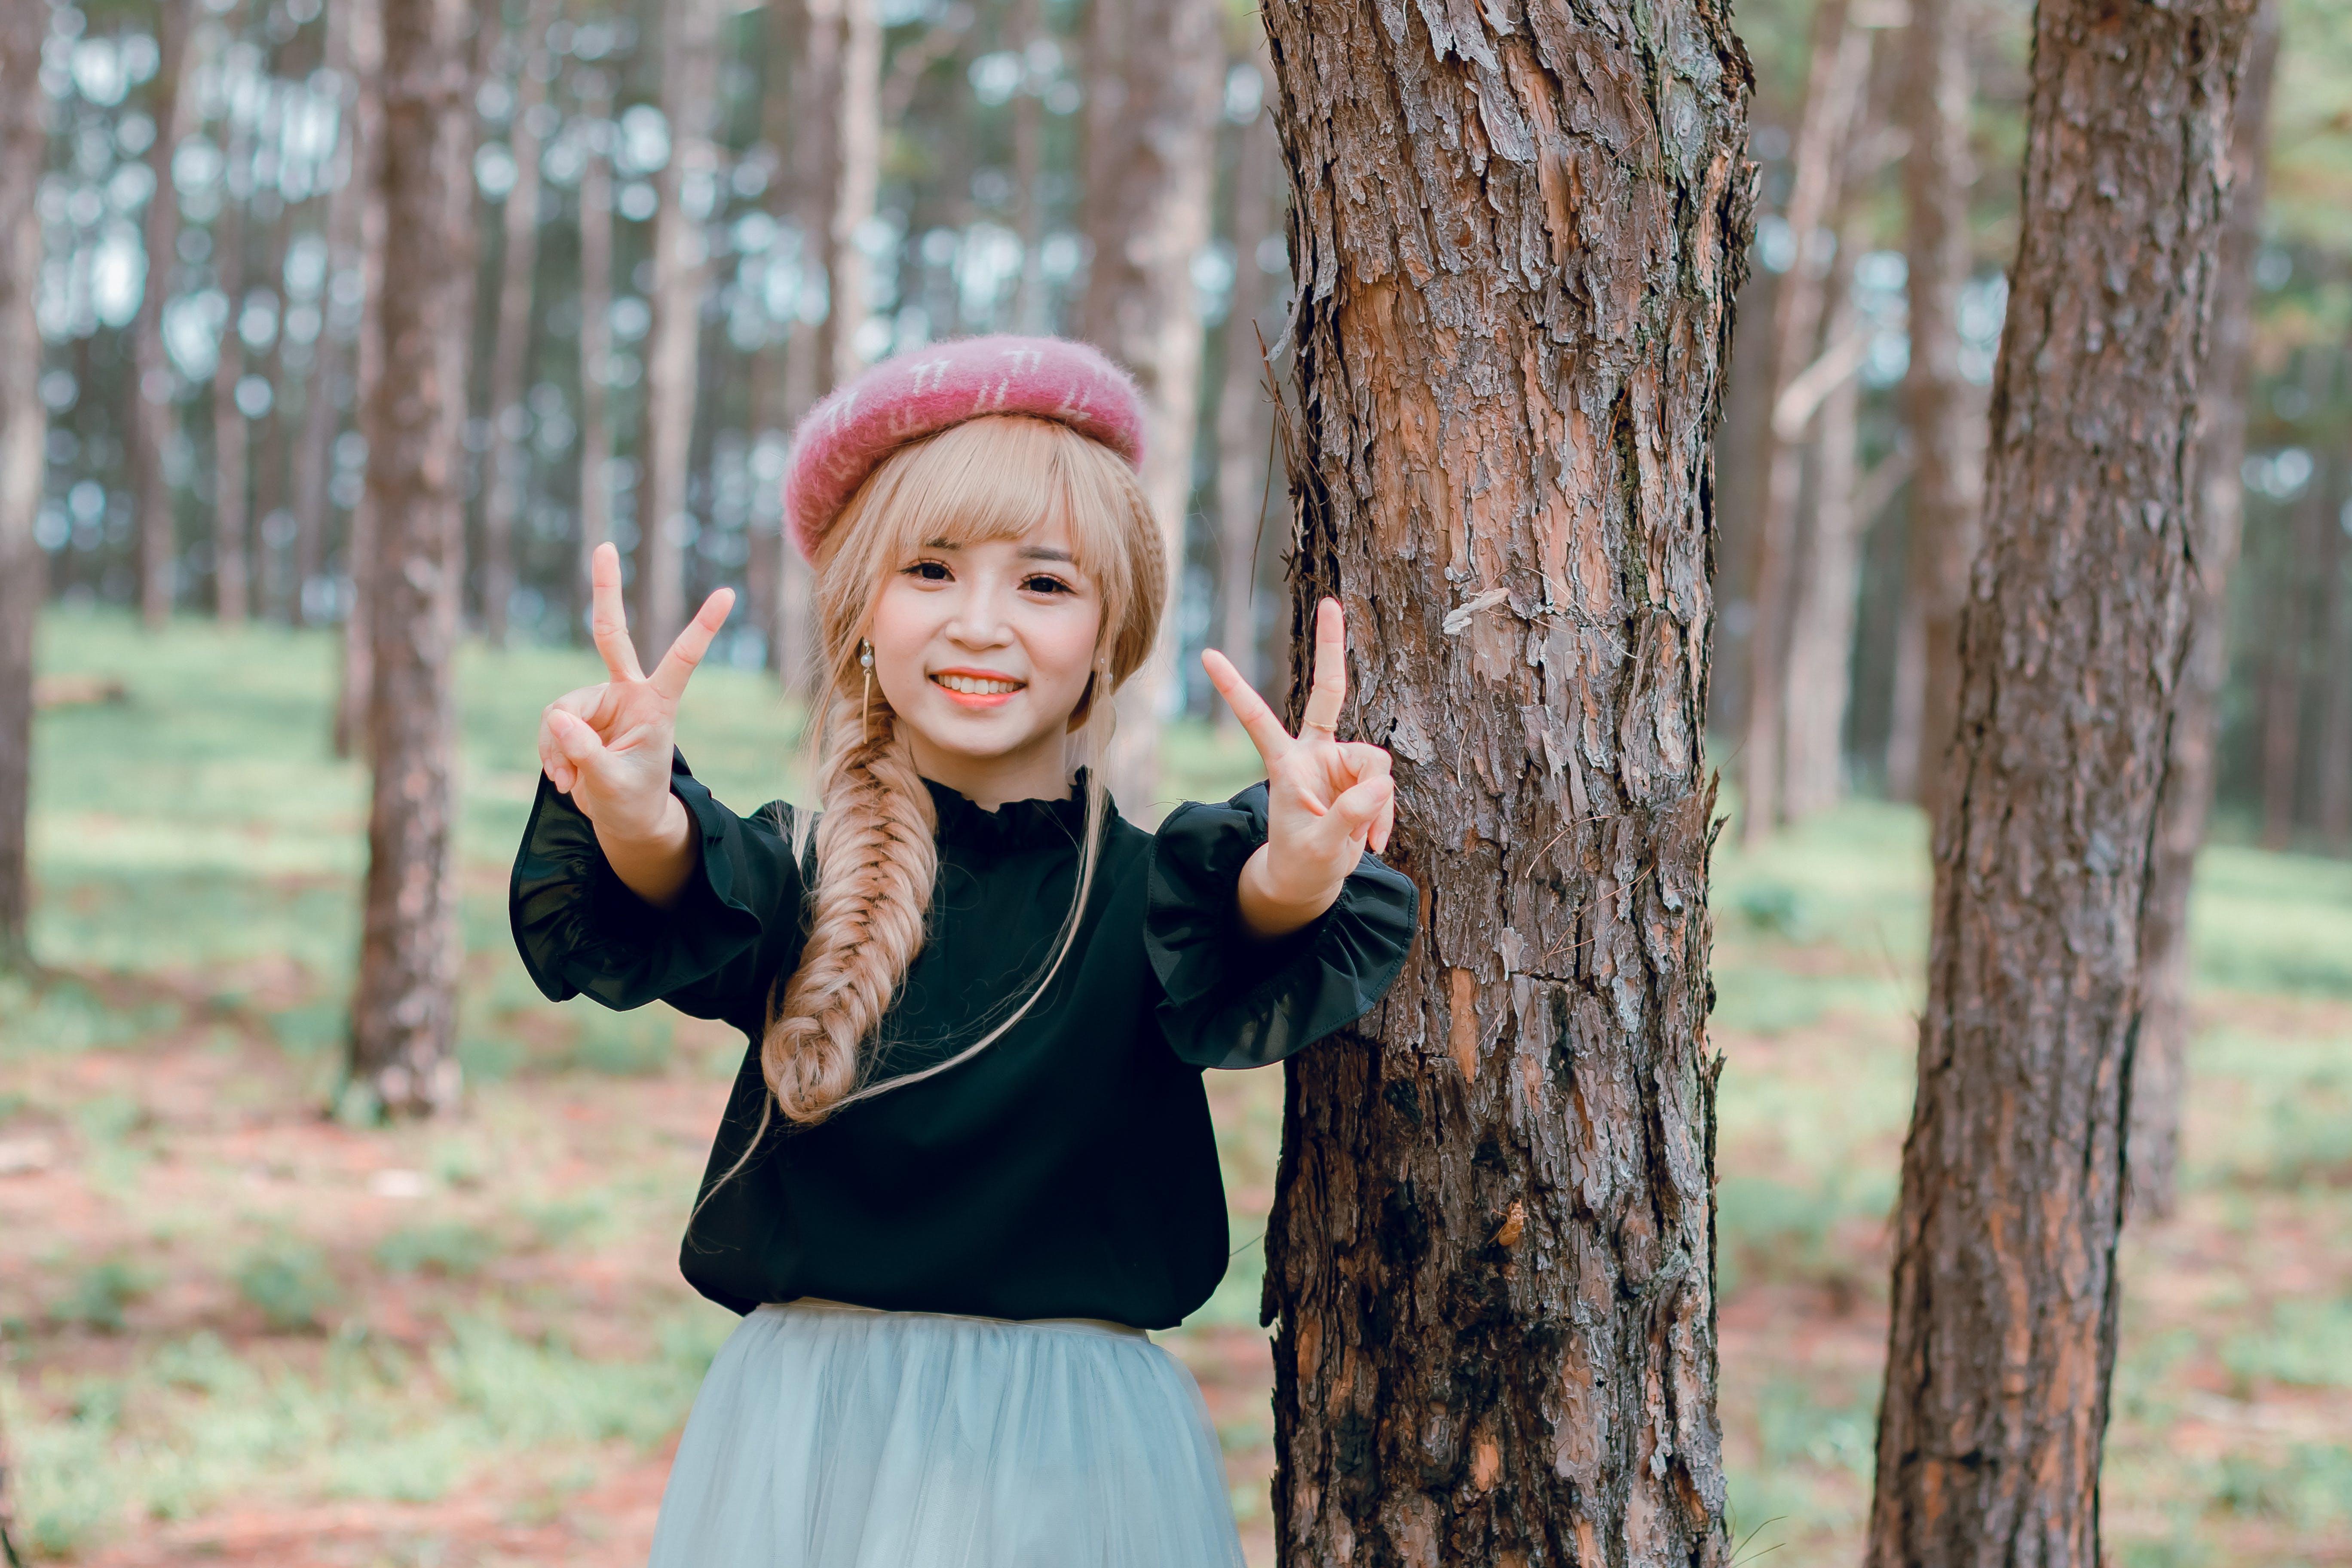 Girl Wearing Black Shirt Standing Near Tree